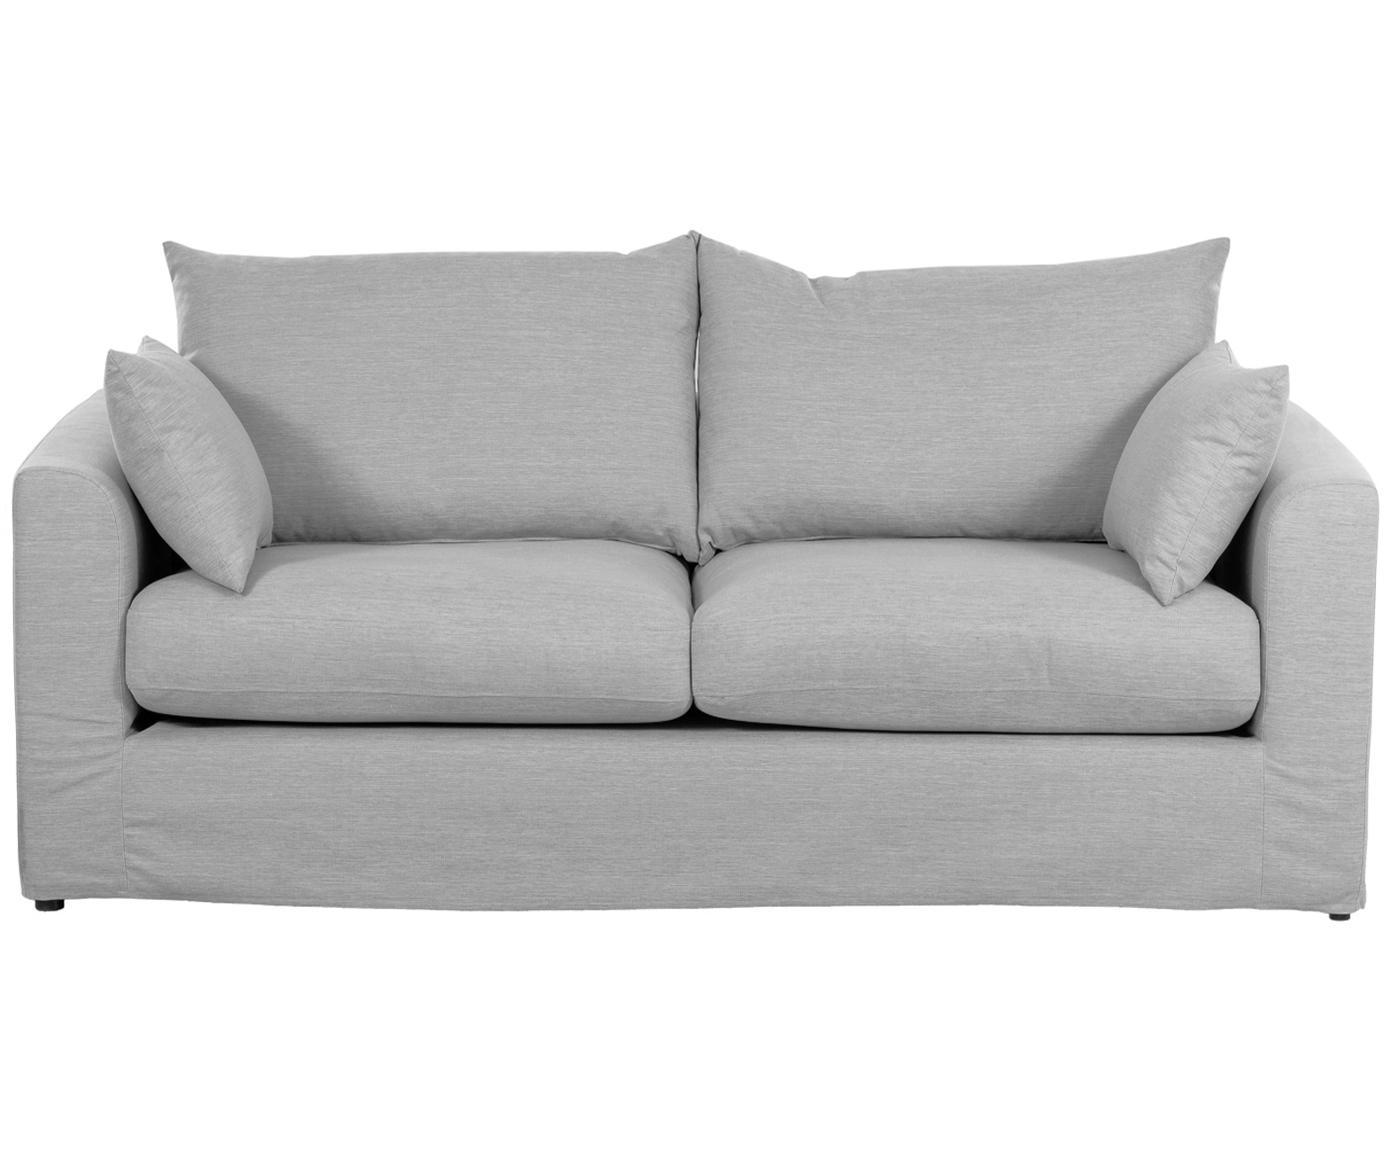 Sofa Zach (2-Sitzer), Bezug: 100% Polypropylen, Webstoff Grau, B 191 x T 90 cm